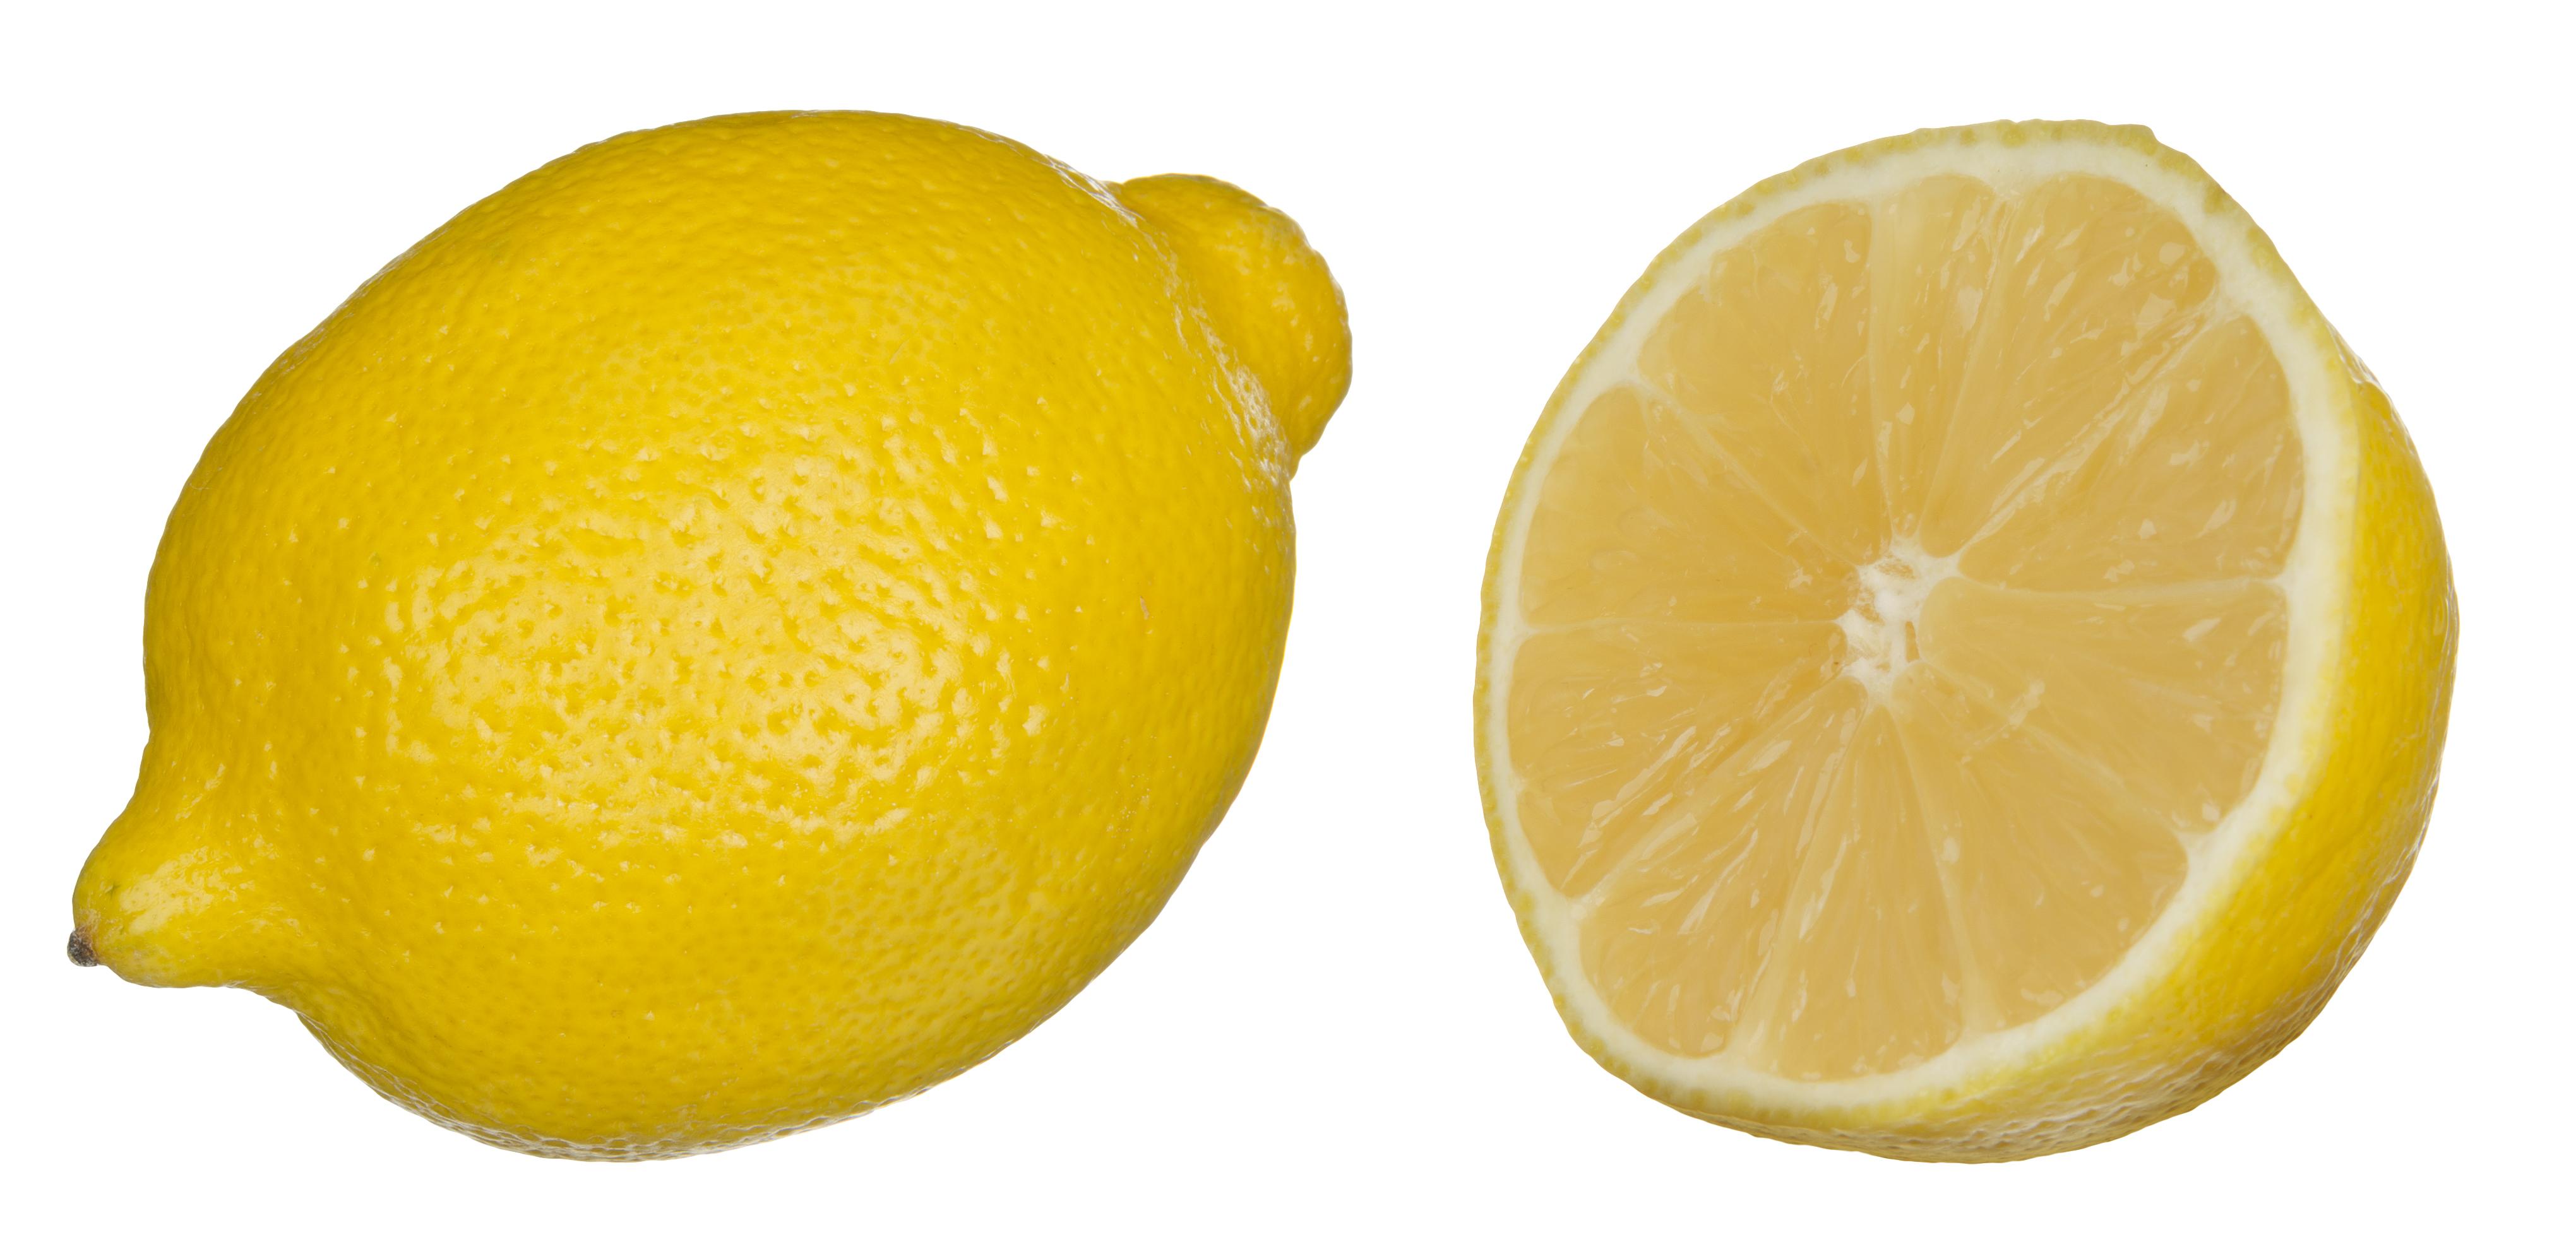 Ripe lemon photo